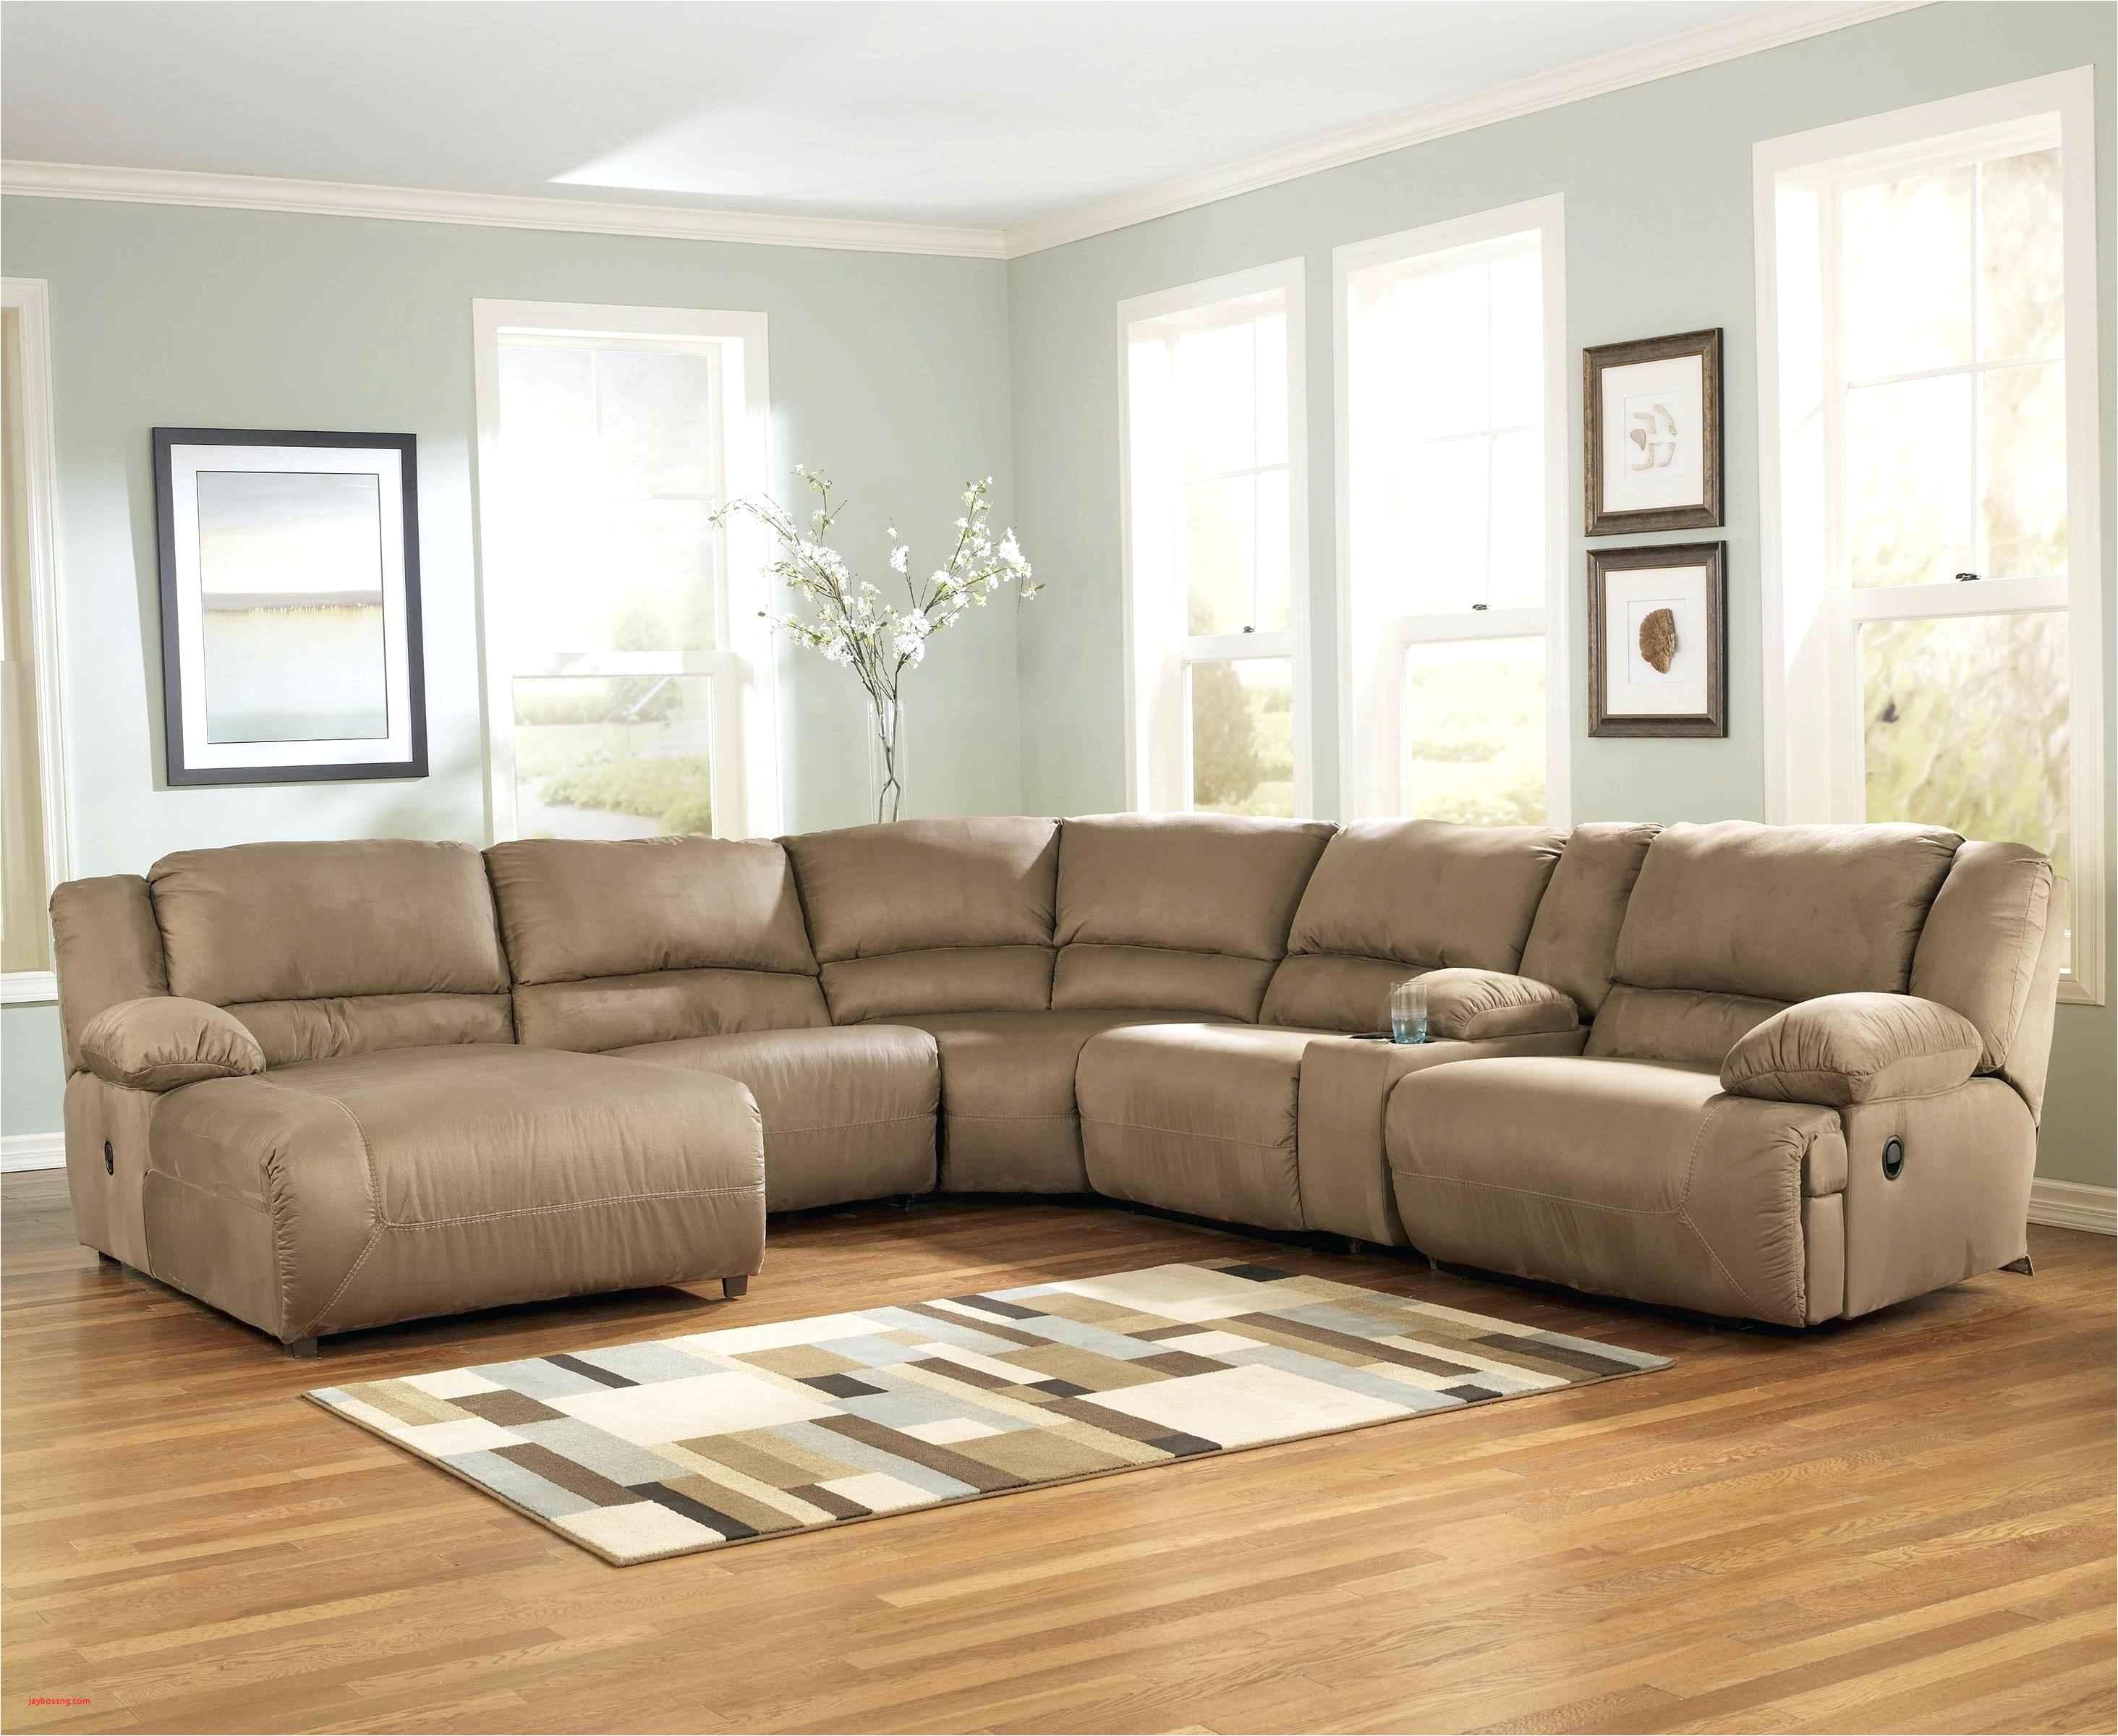 furniture store in boardman ohio elegant furniture ideas furnitureres in arlington tx discount new